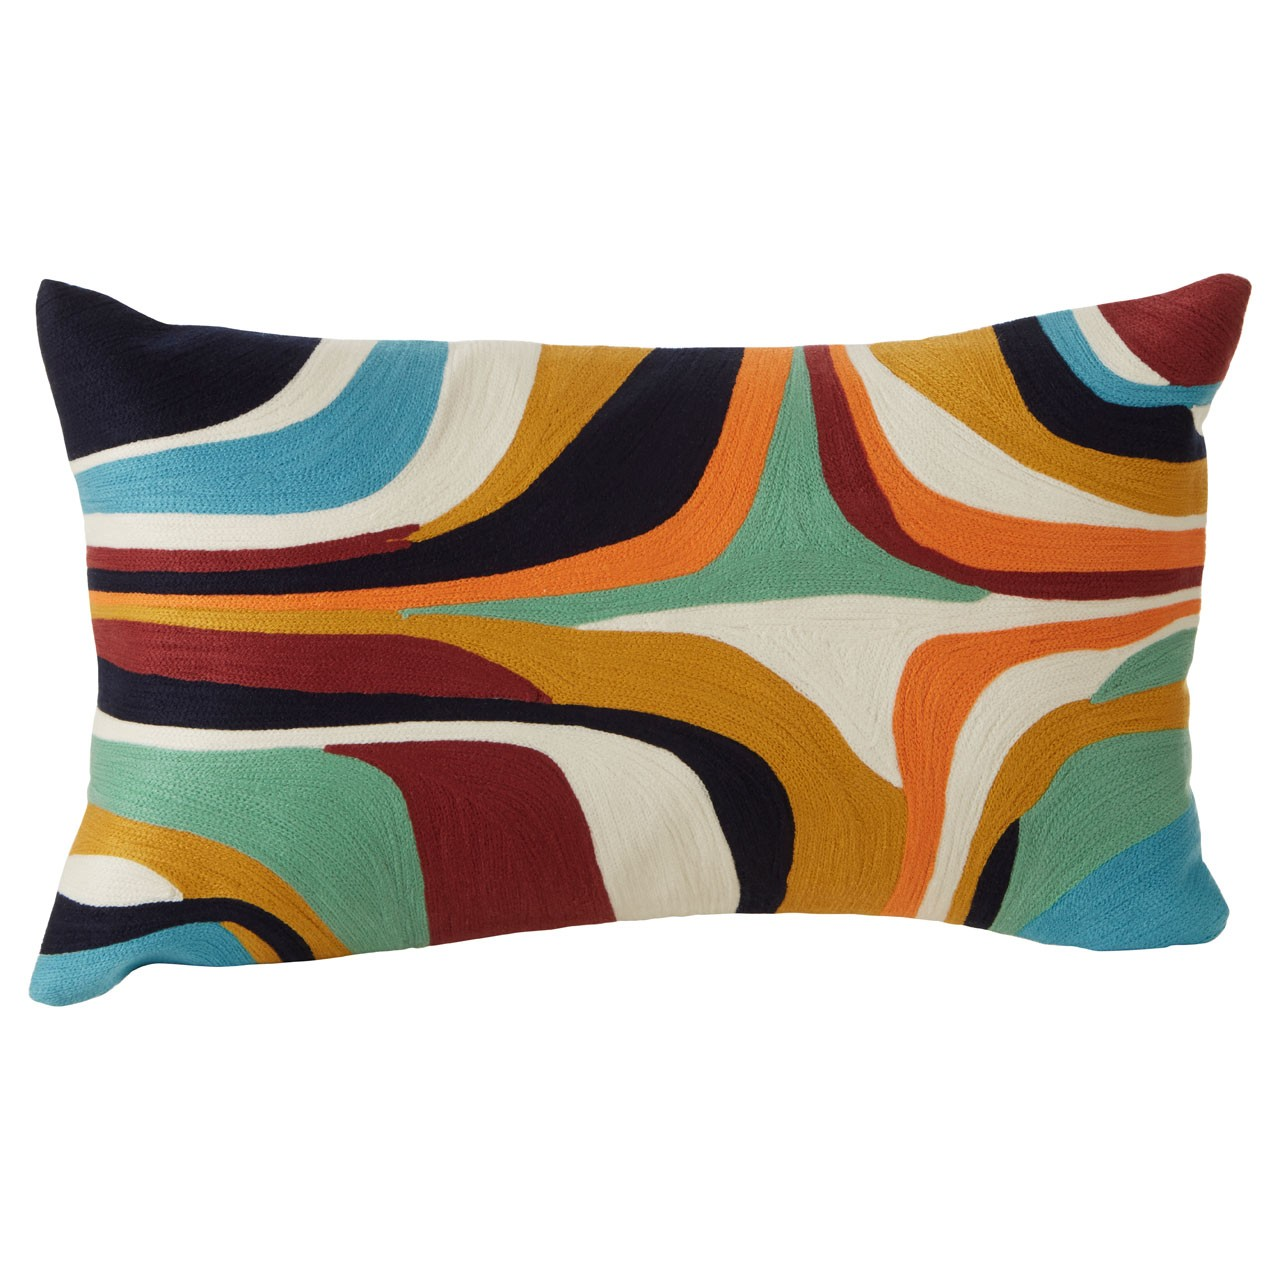 Cushion, £30, Homebody Decor